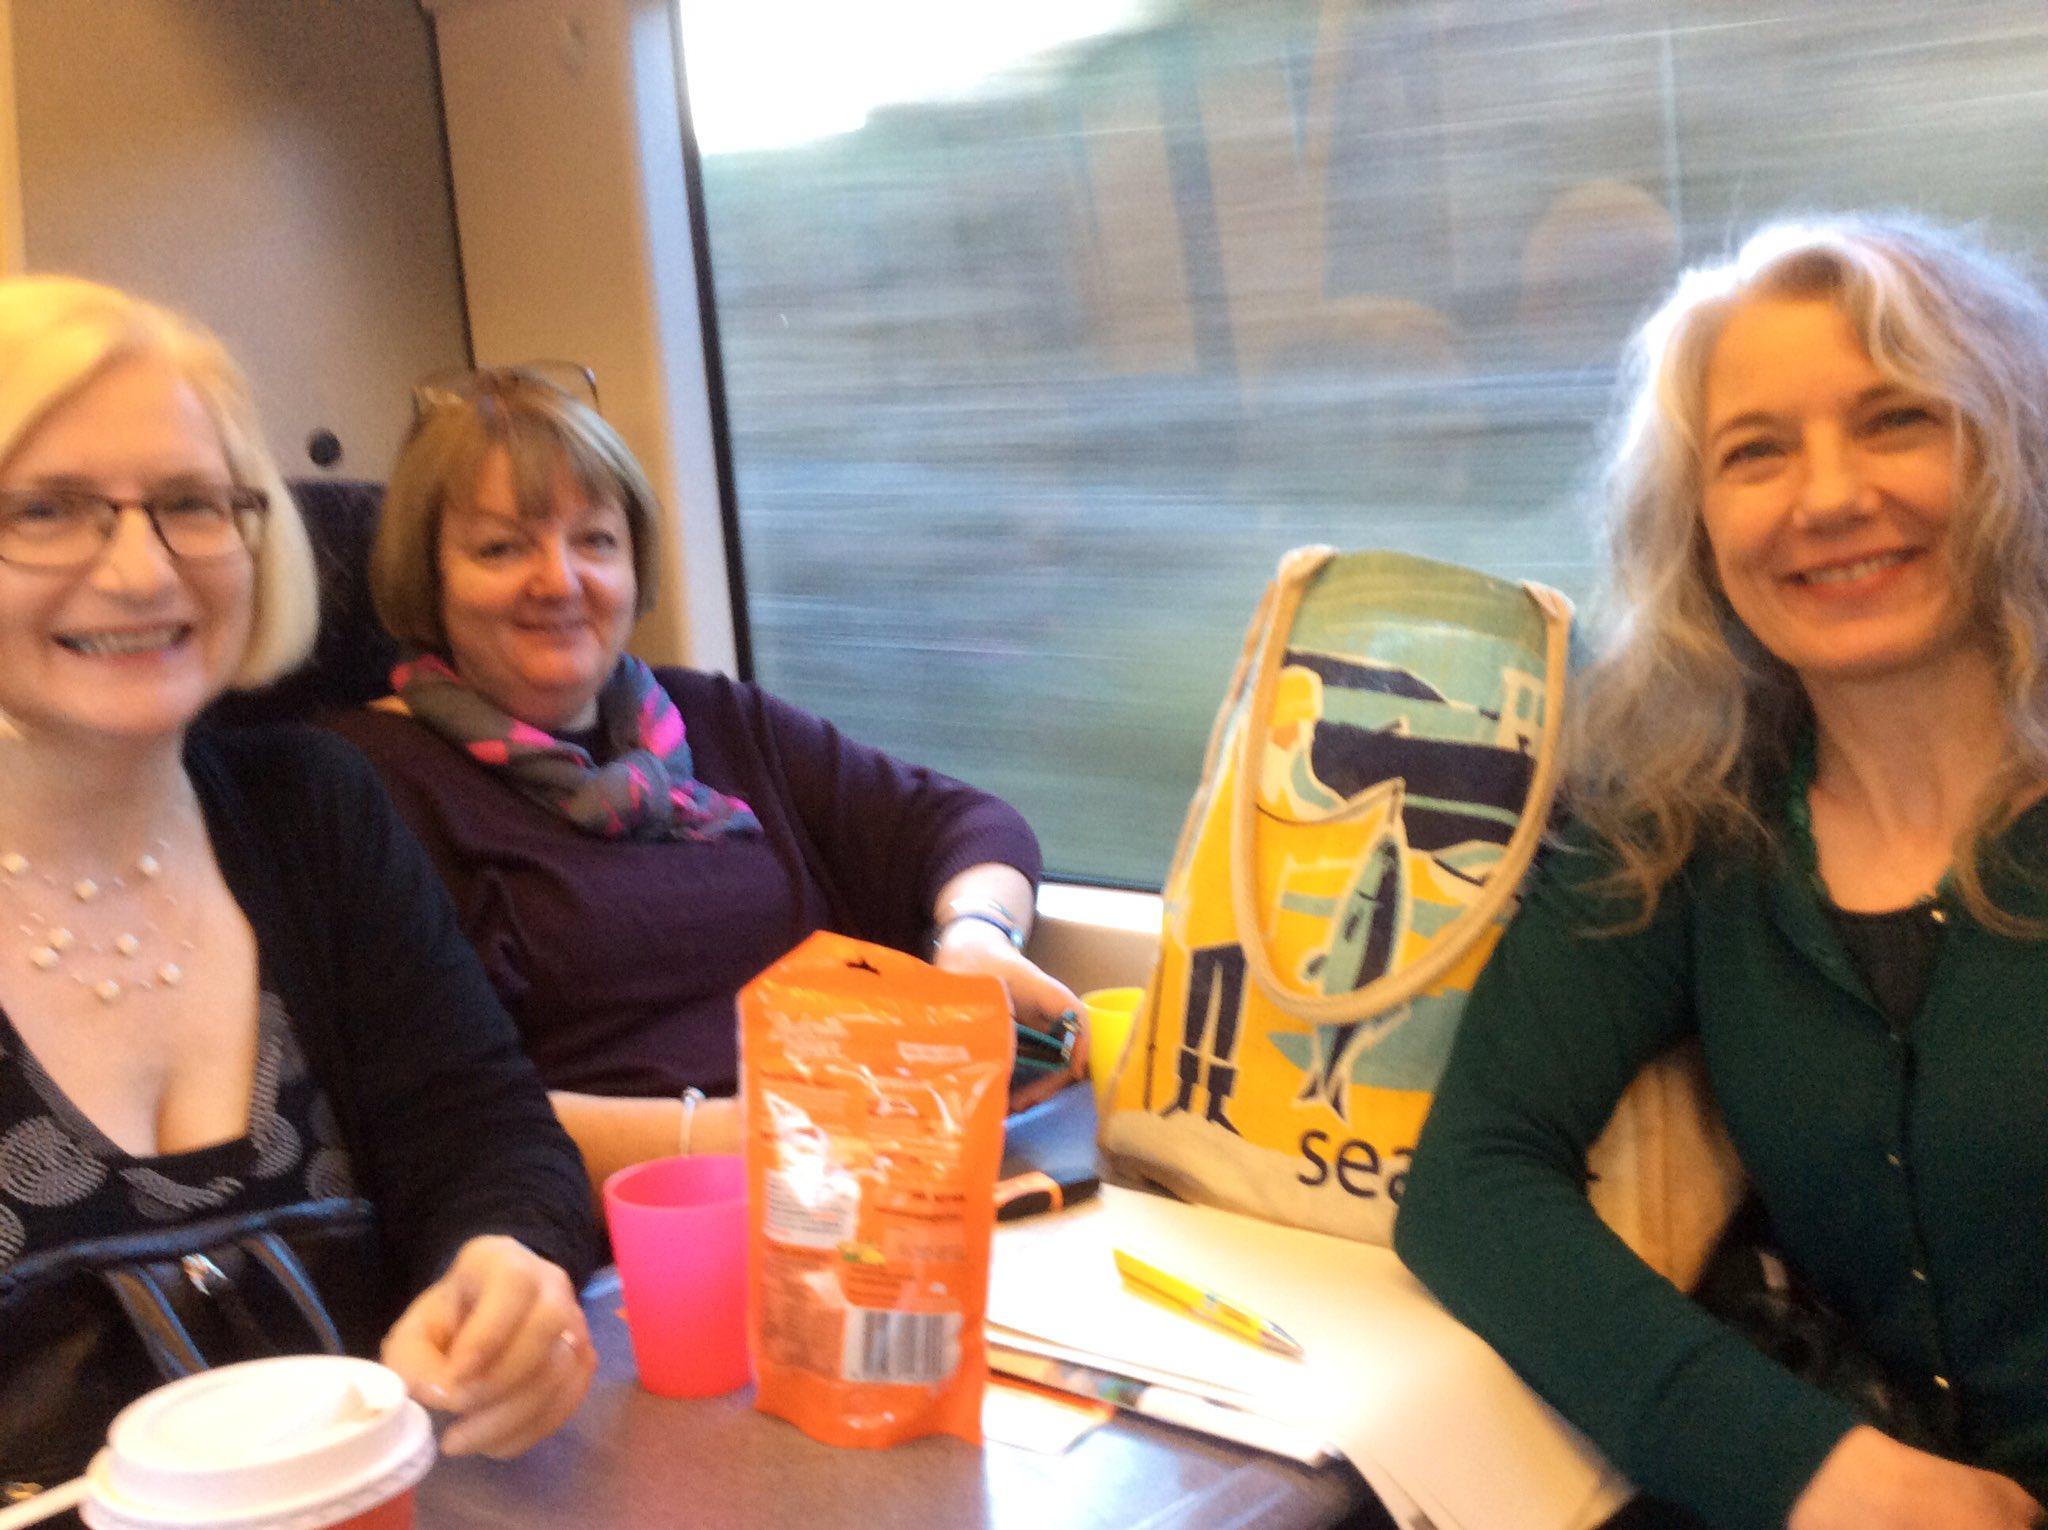 @JennyForeman @MoragHiggison @FionaLaing on our way to #scotinfolit https://t.co/z4zpQI0sES